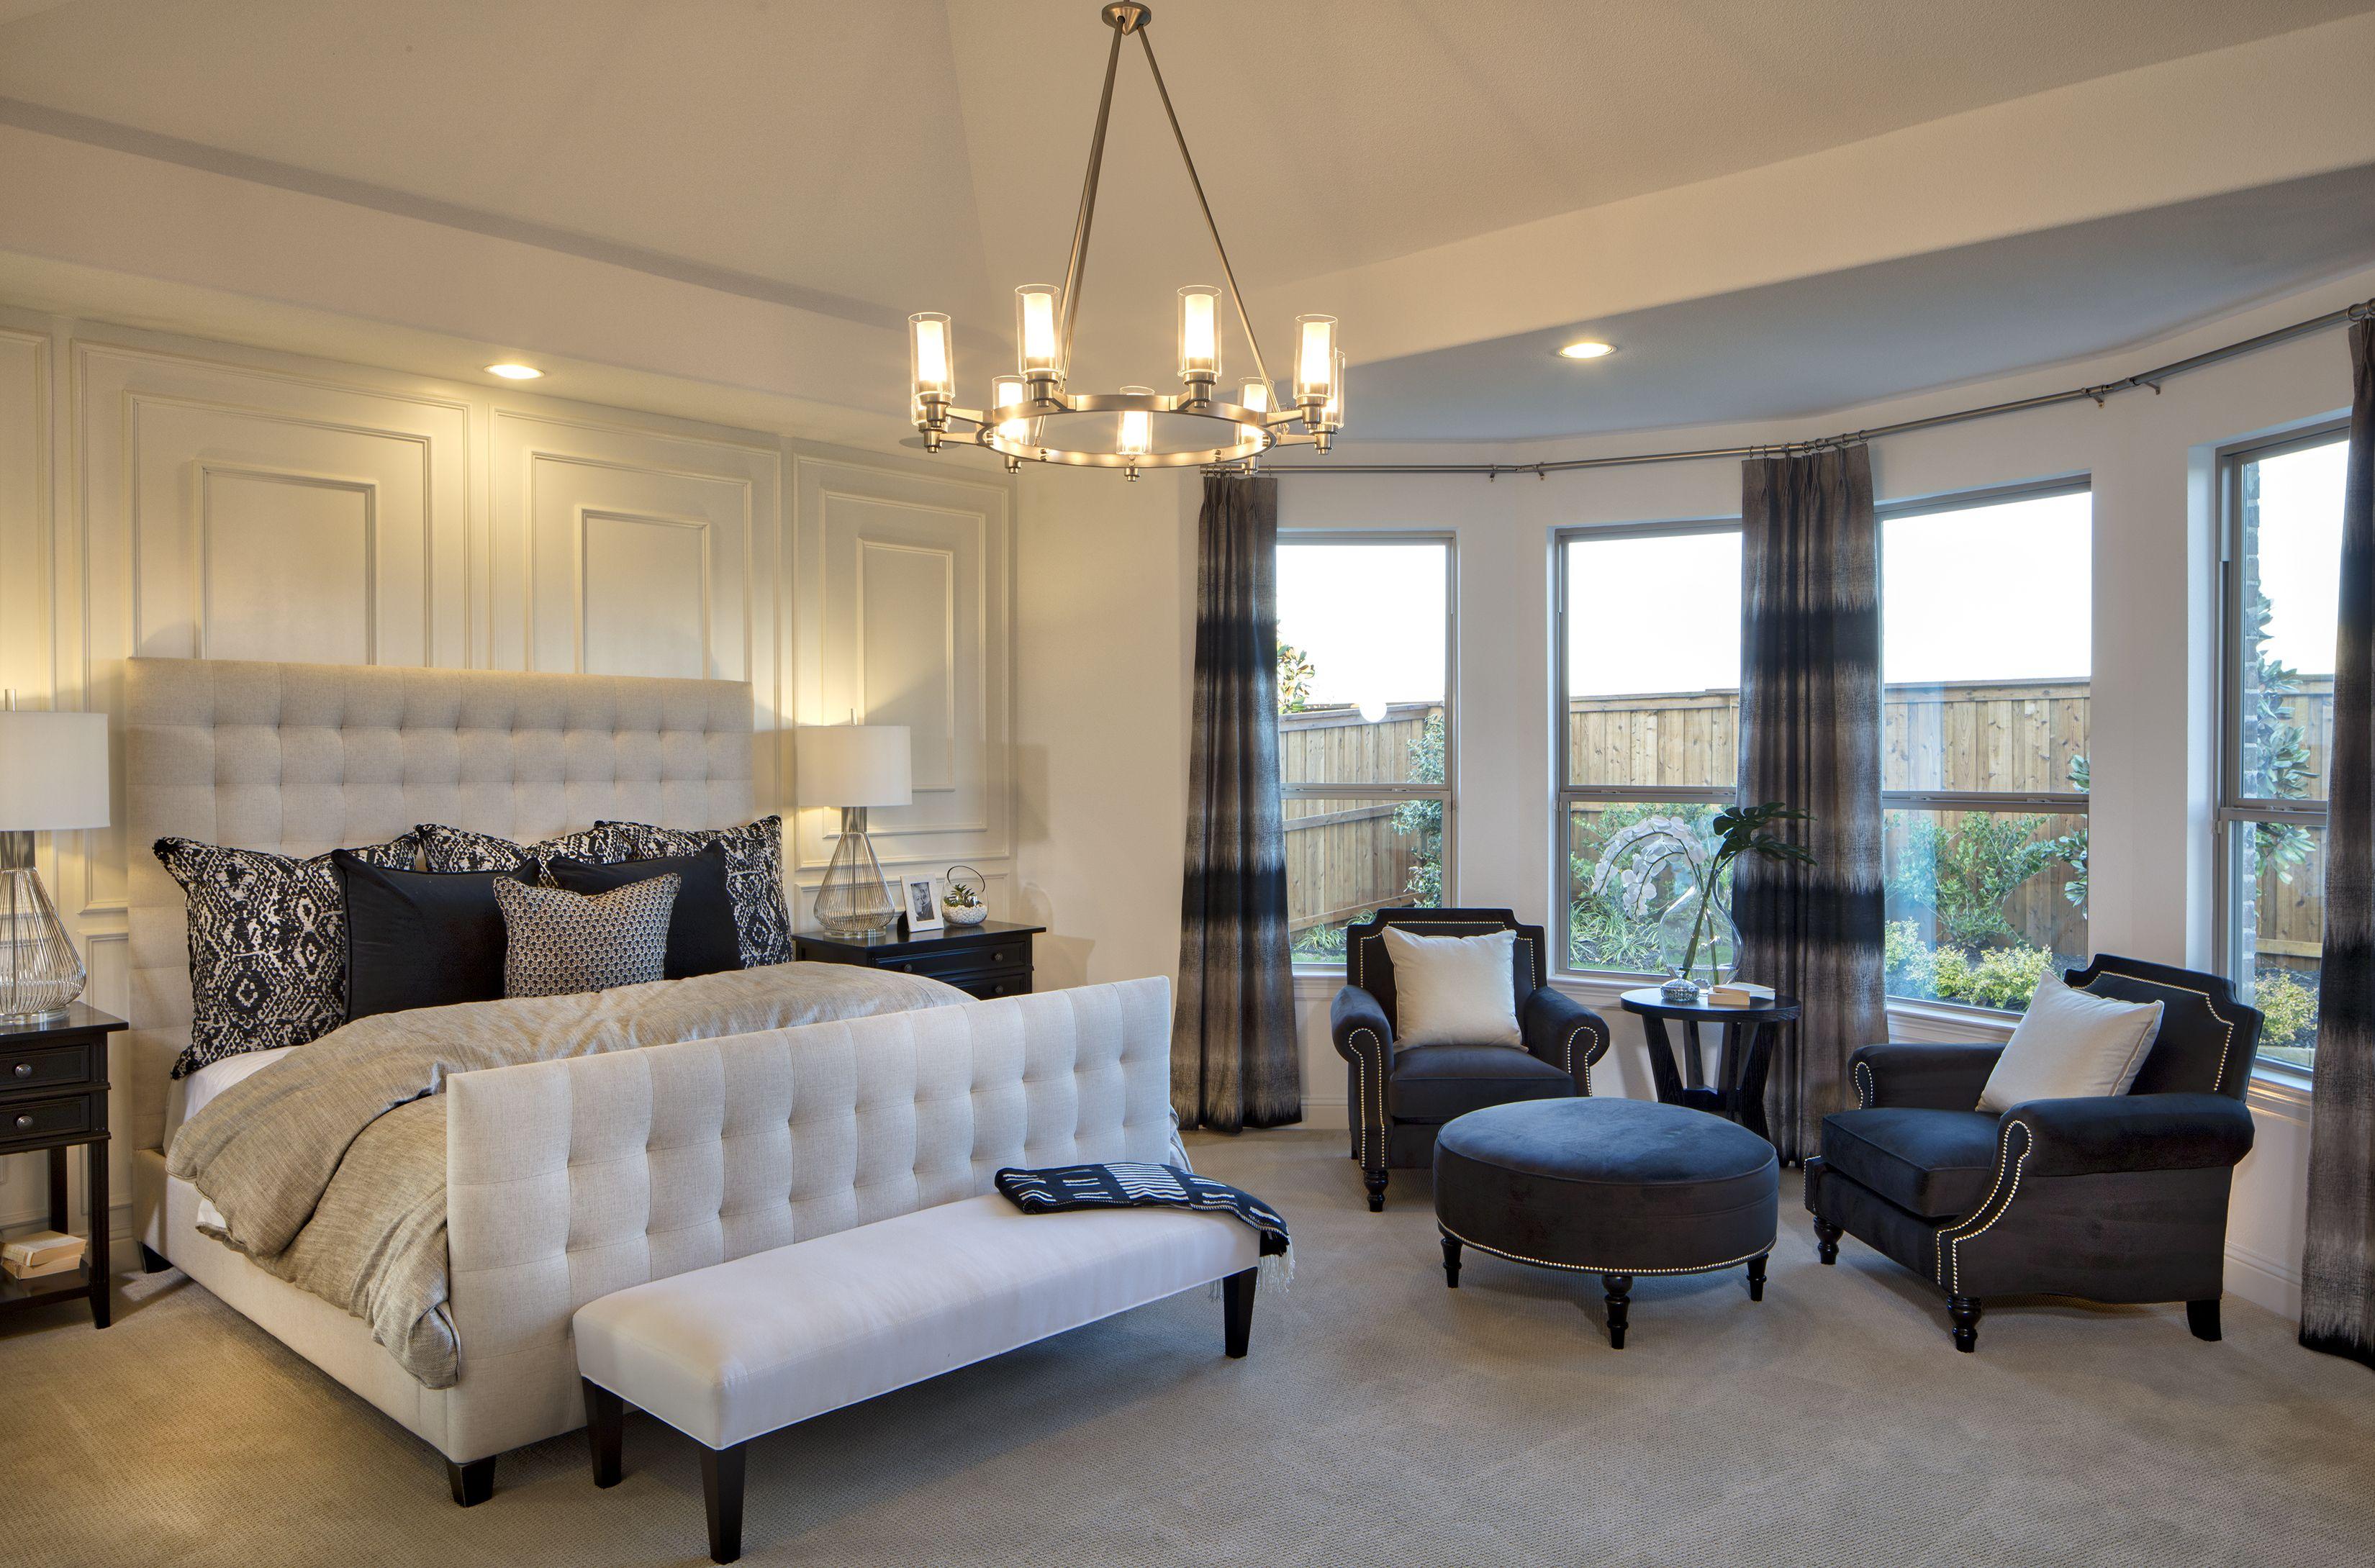 Bedroom dreamhome lightfixture home interior design decorating also luxurybrownbedrooms stylish beedroom in pinterest rh